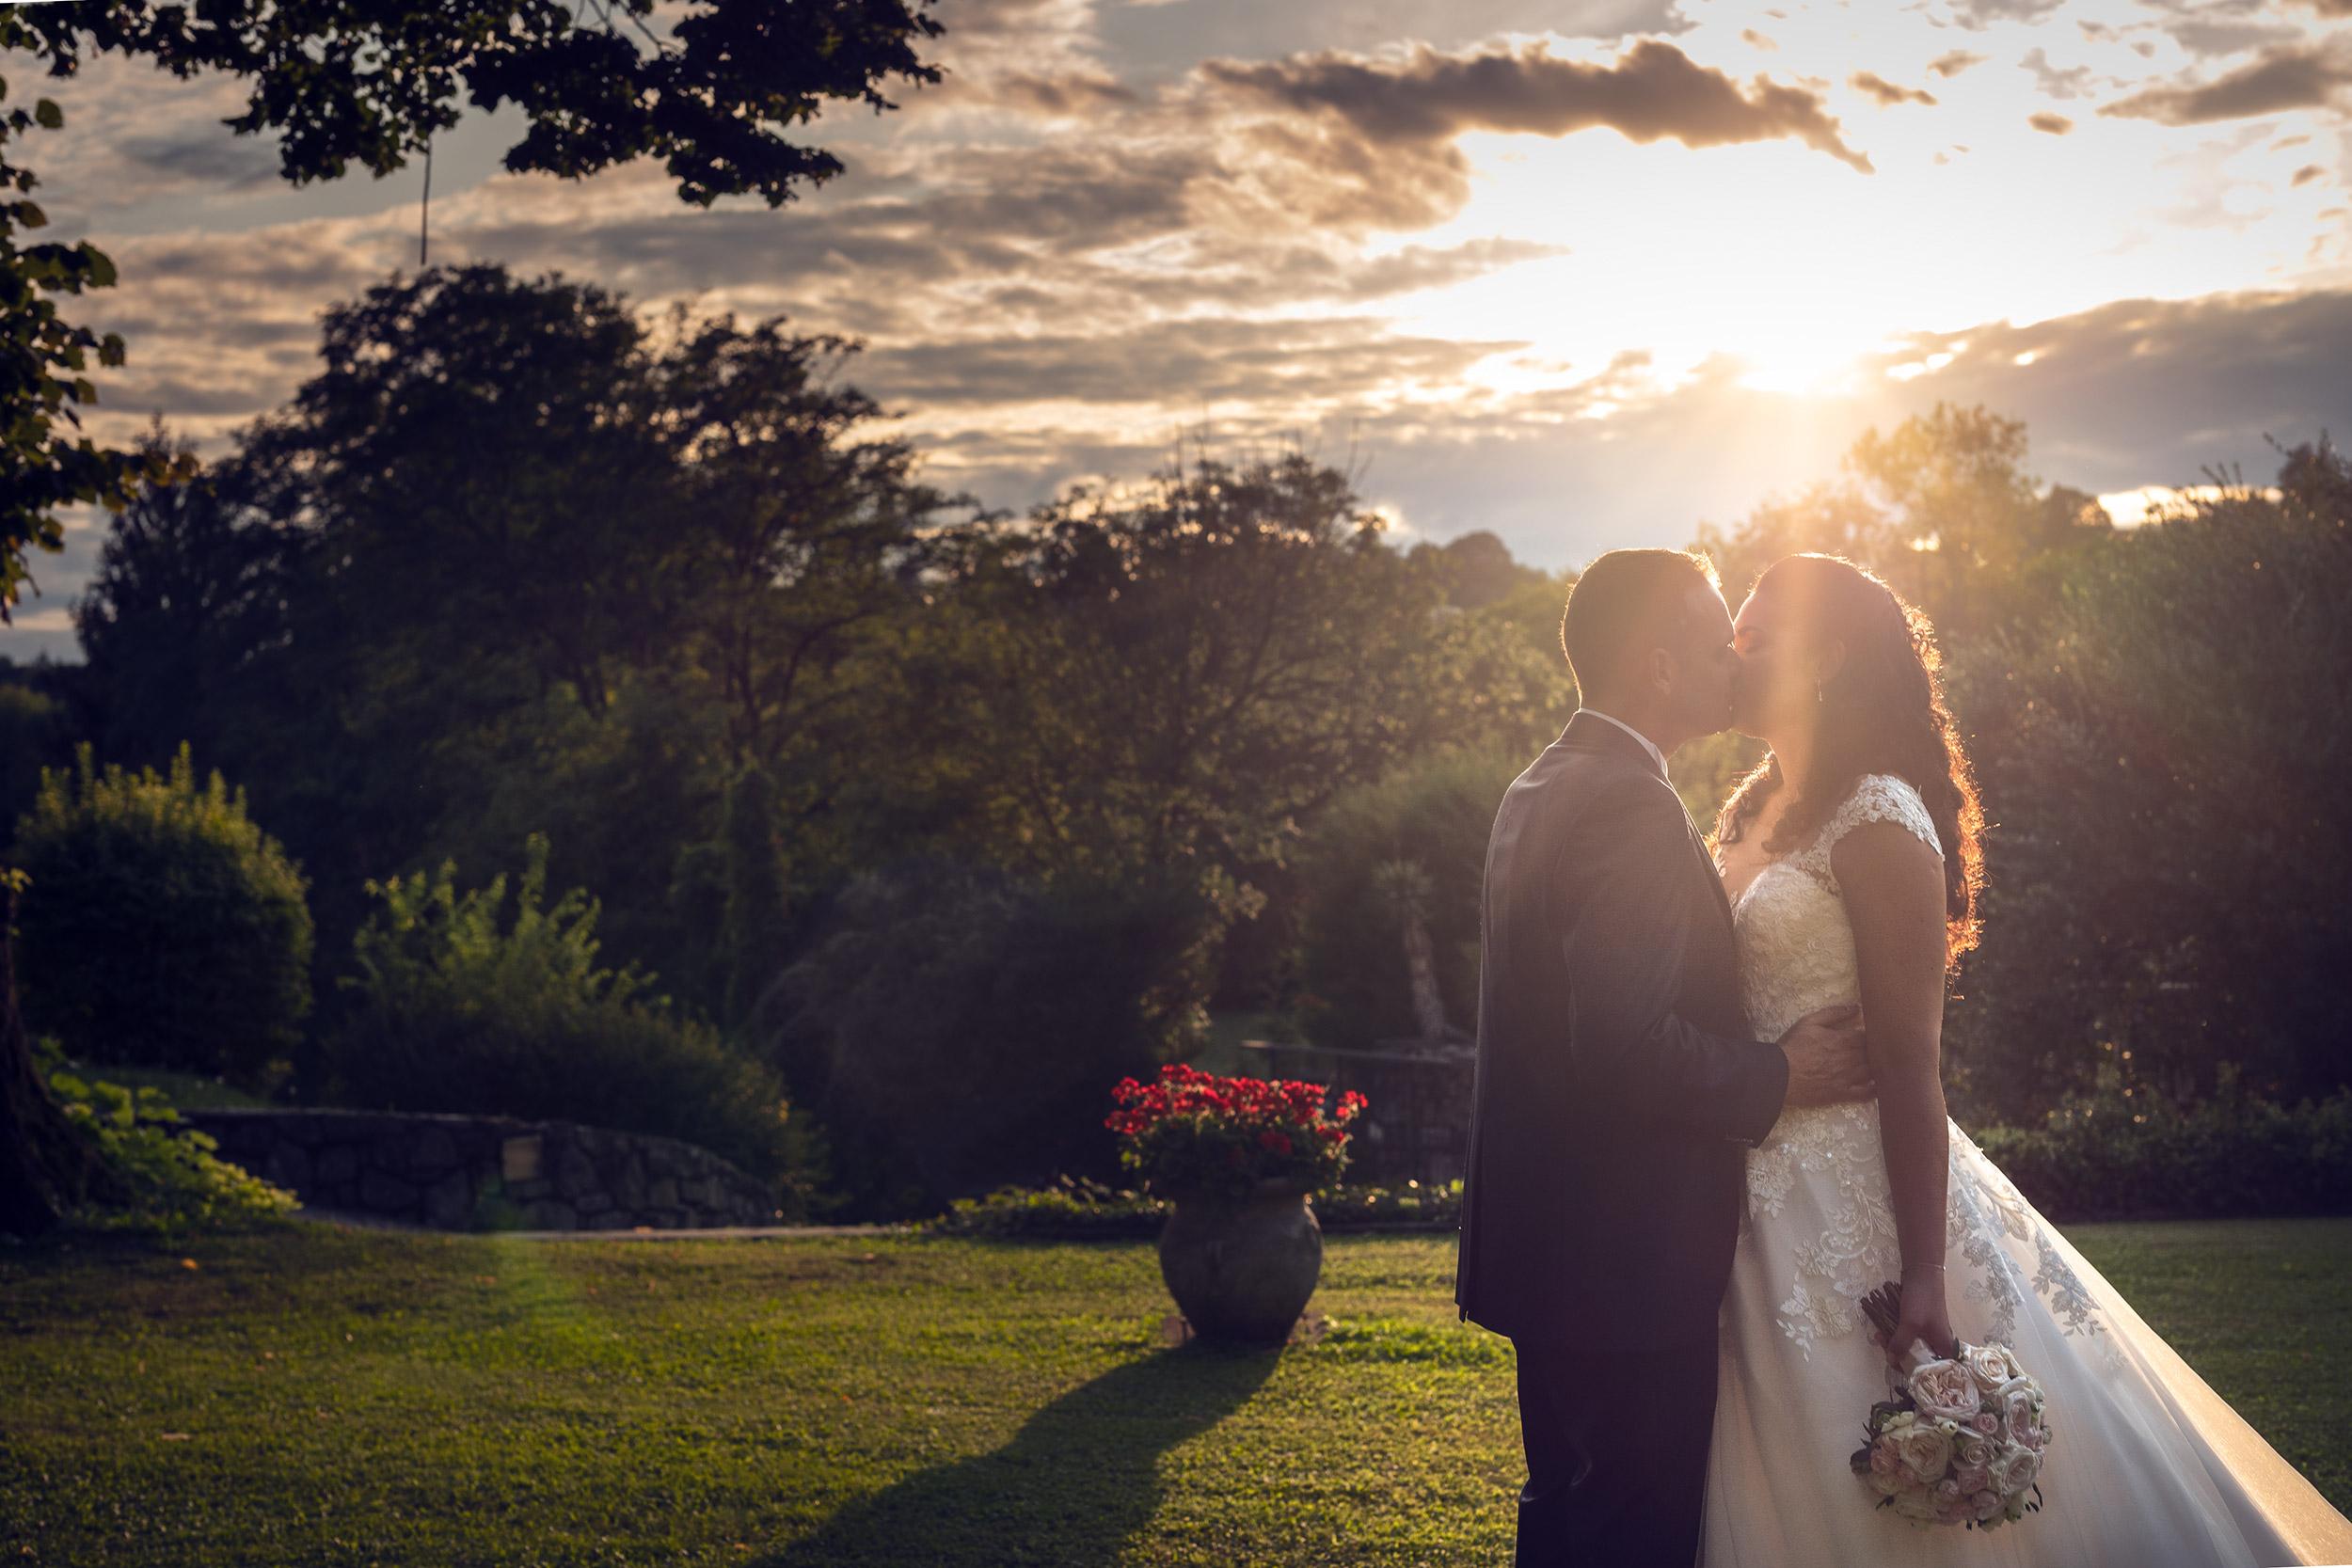 051 reportage wedding sposi foto matrimonio castello casiglio erba como 1